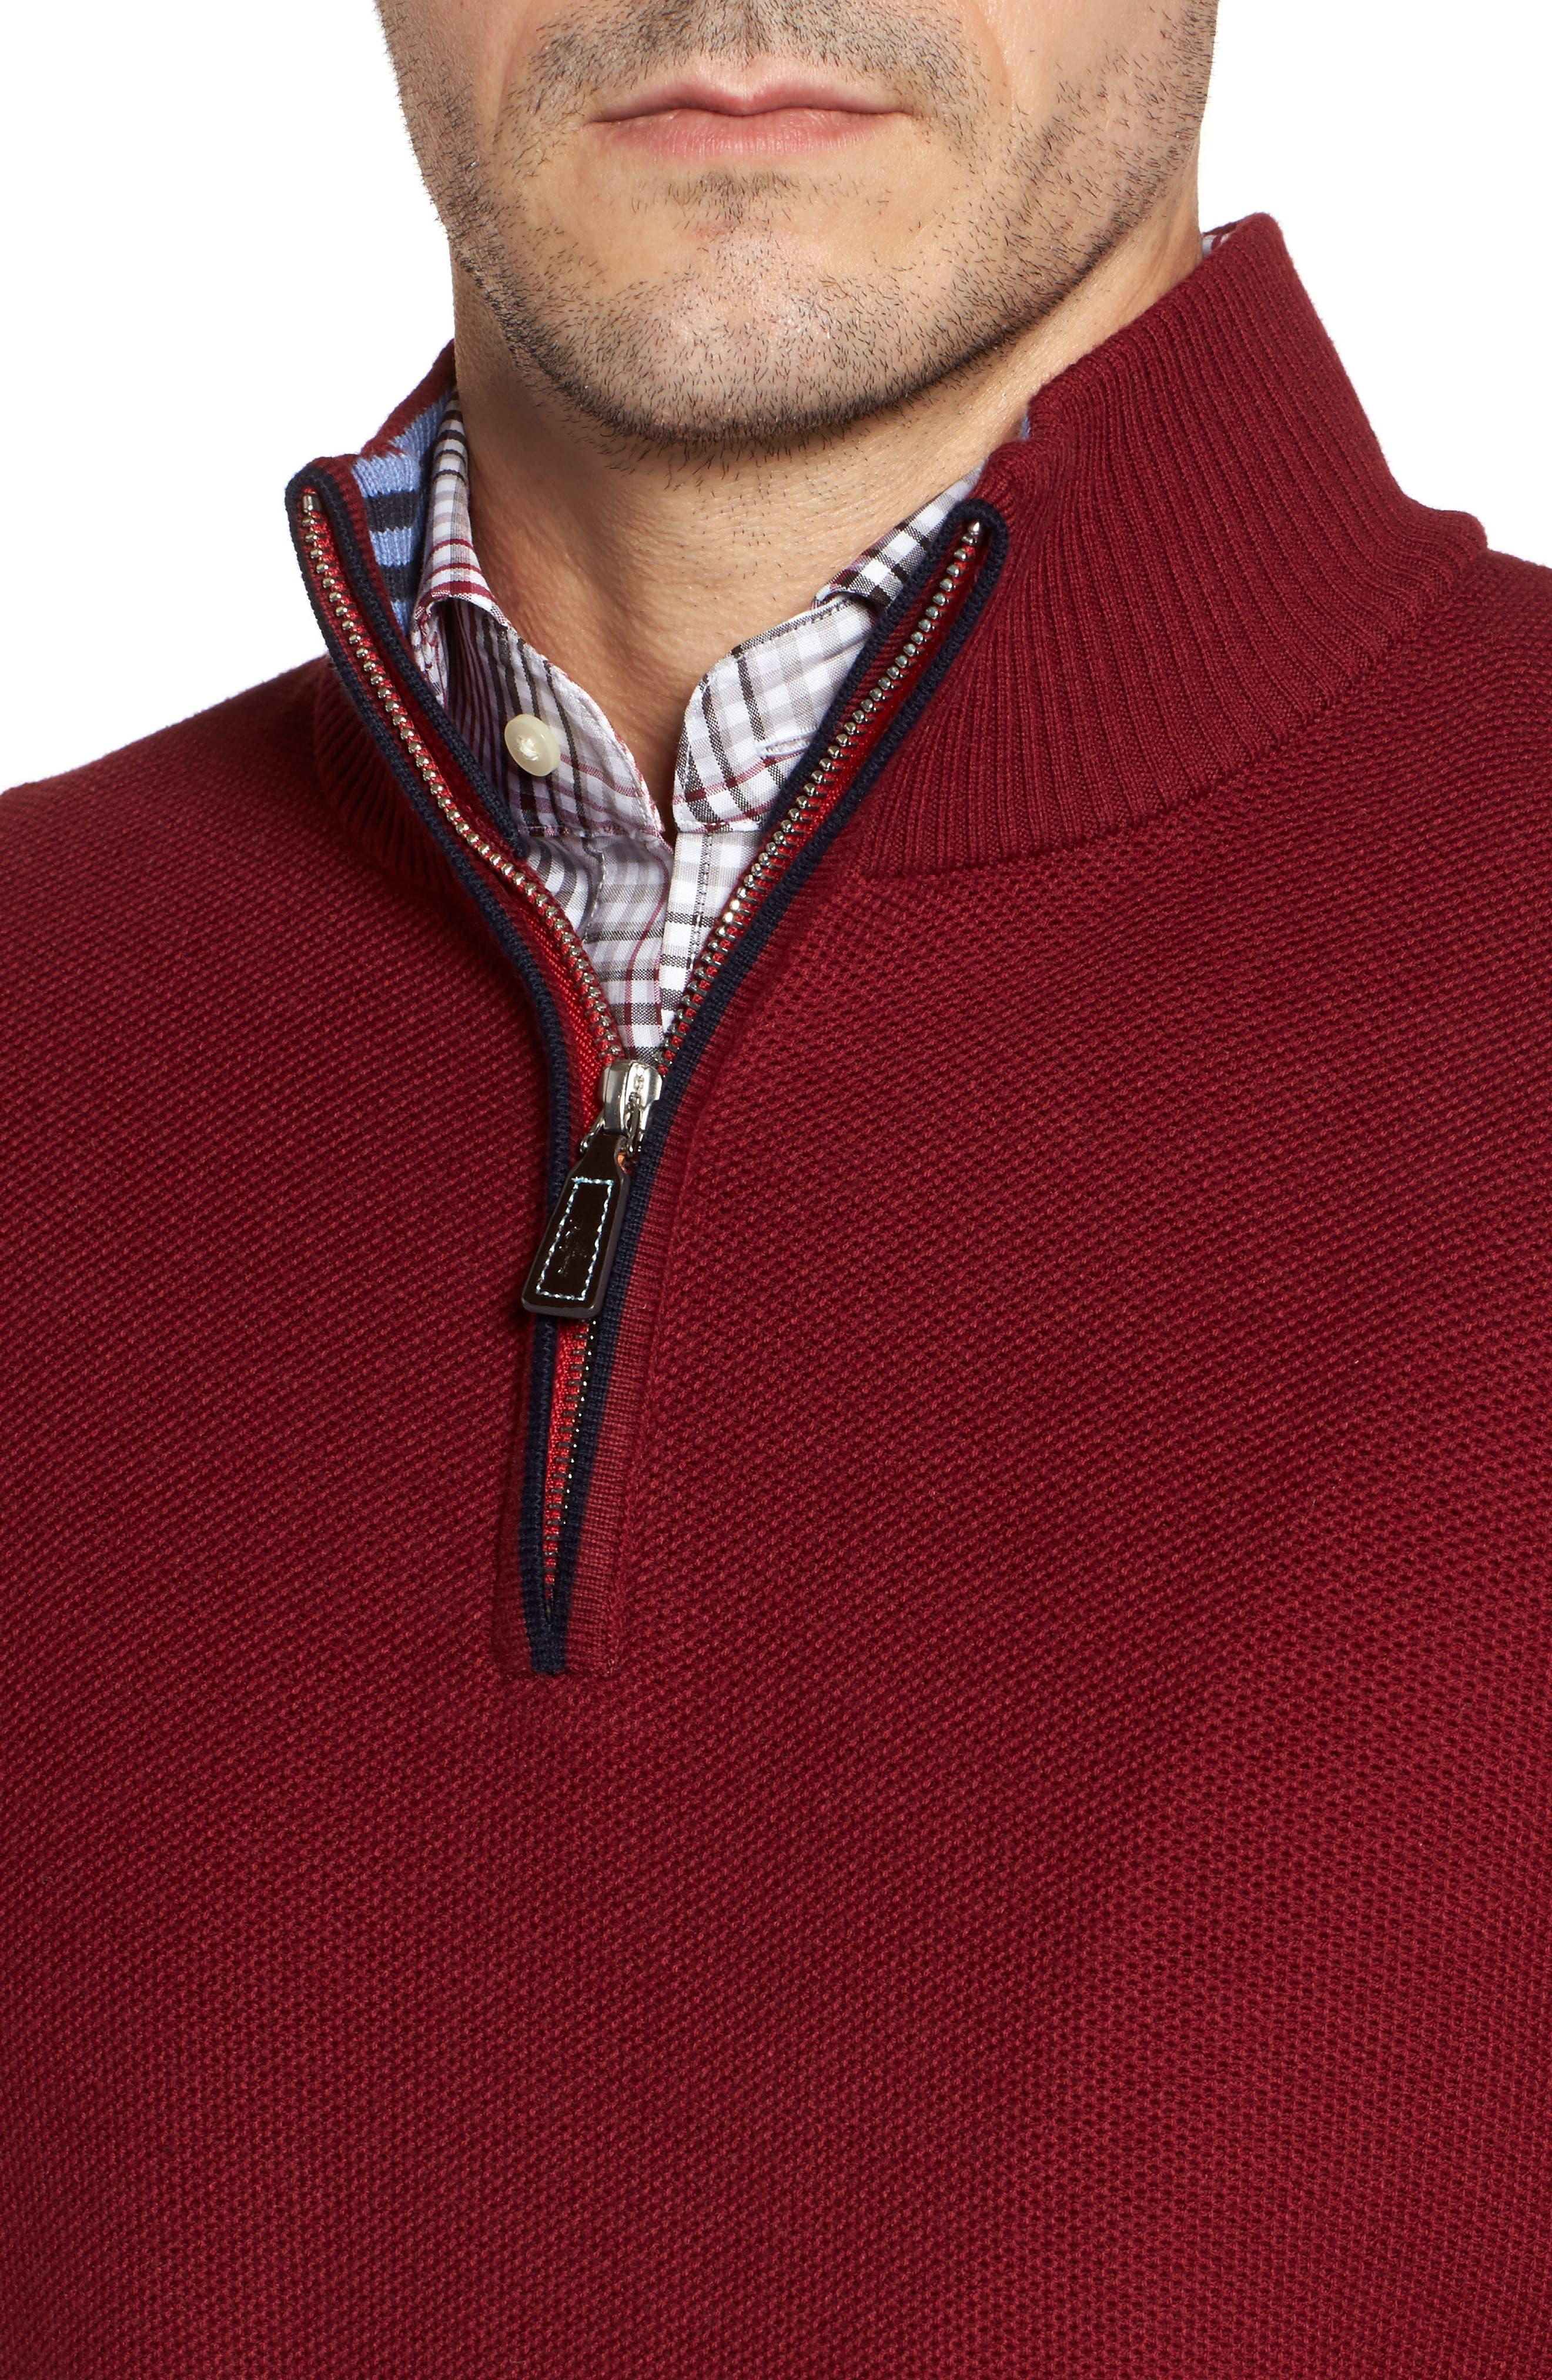 Prien Tipped Quarter Zip Sweater,                             Alternate thumbnail 4, color,                             600